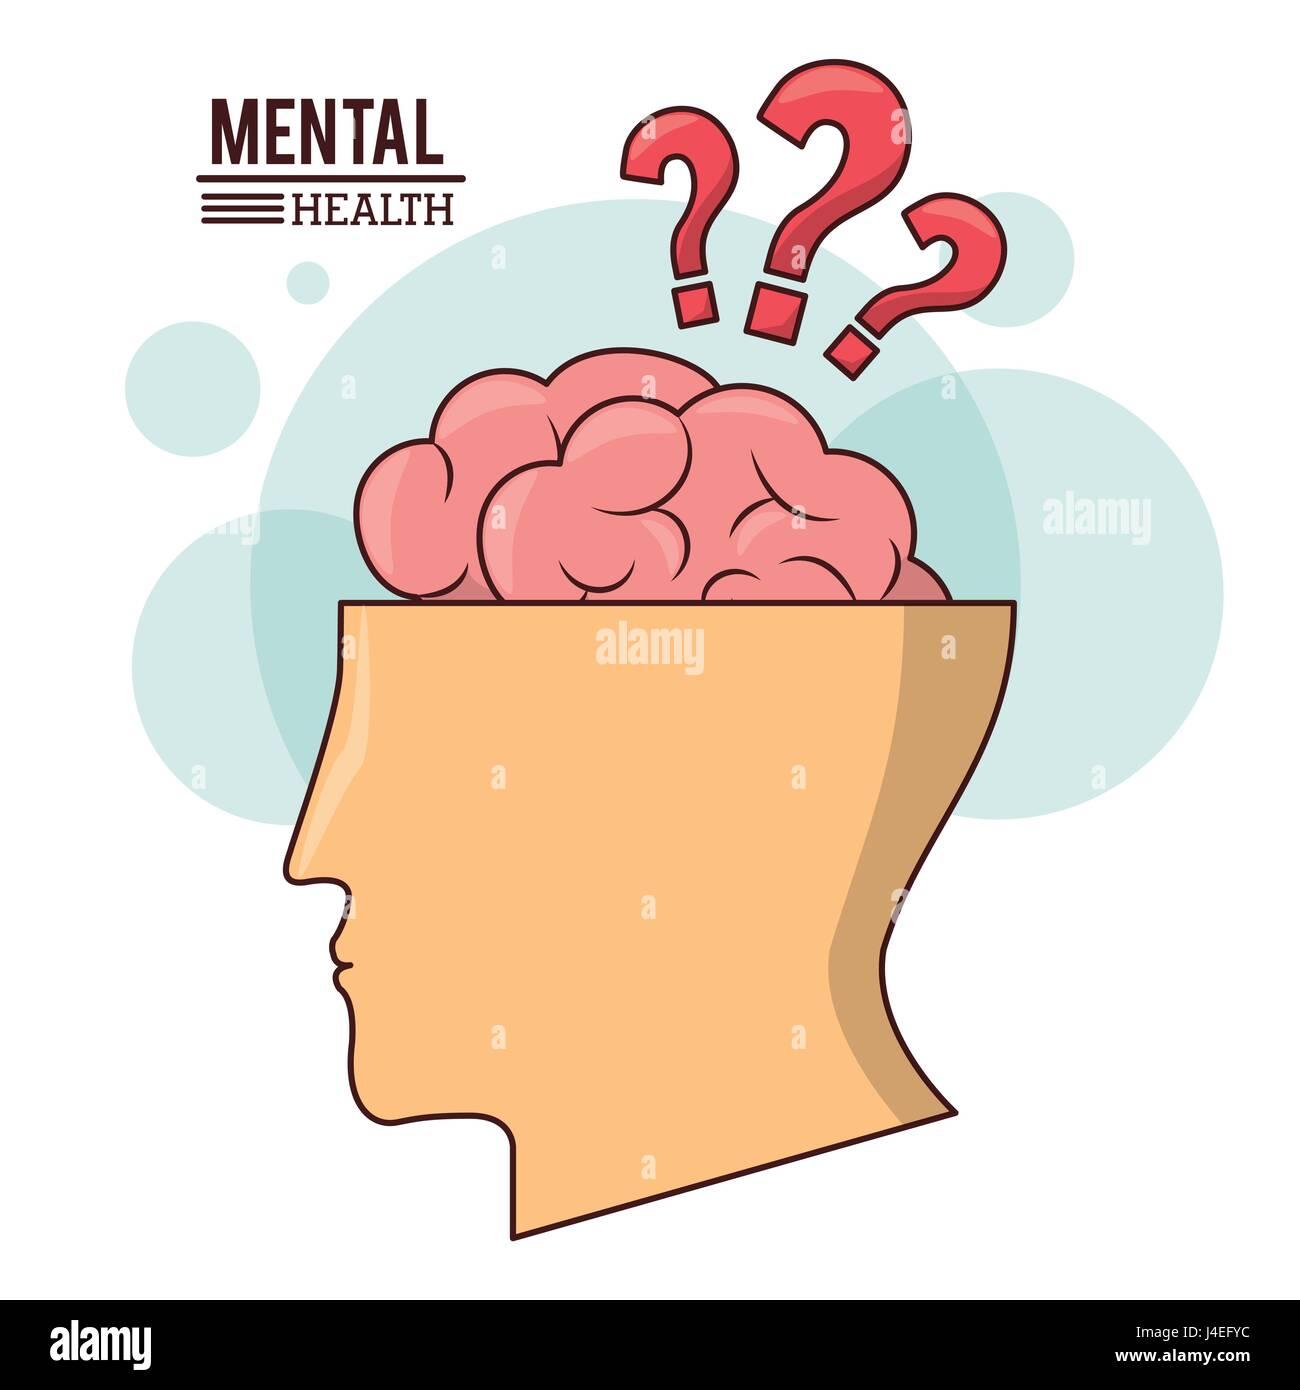 mental health, human head brain with question mark symbol - Stock Image